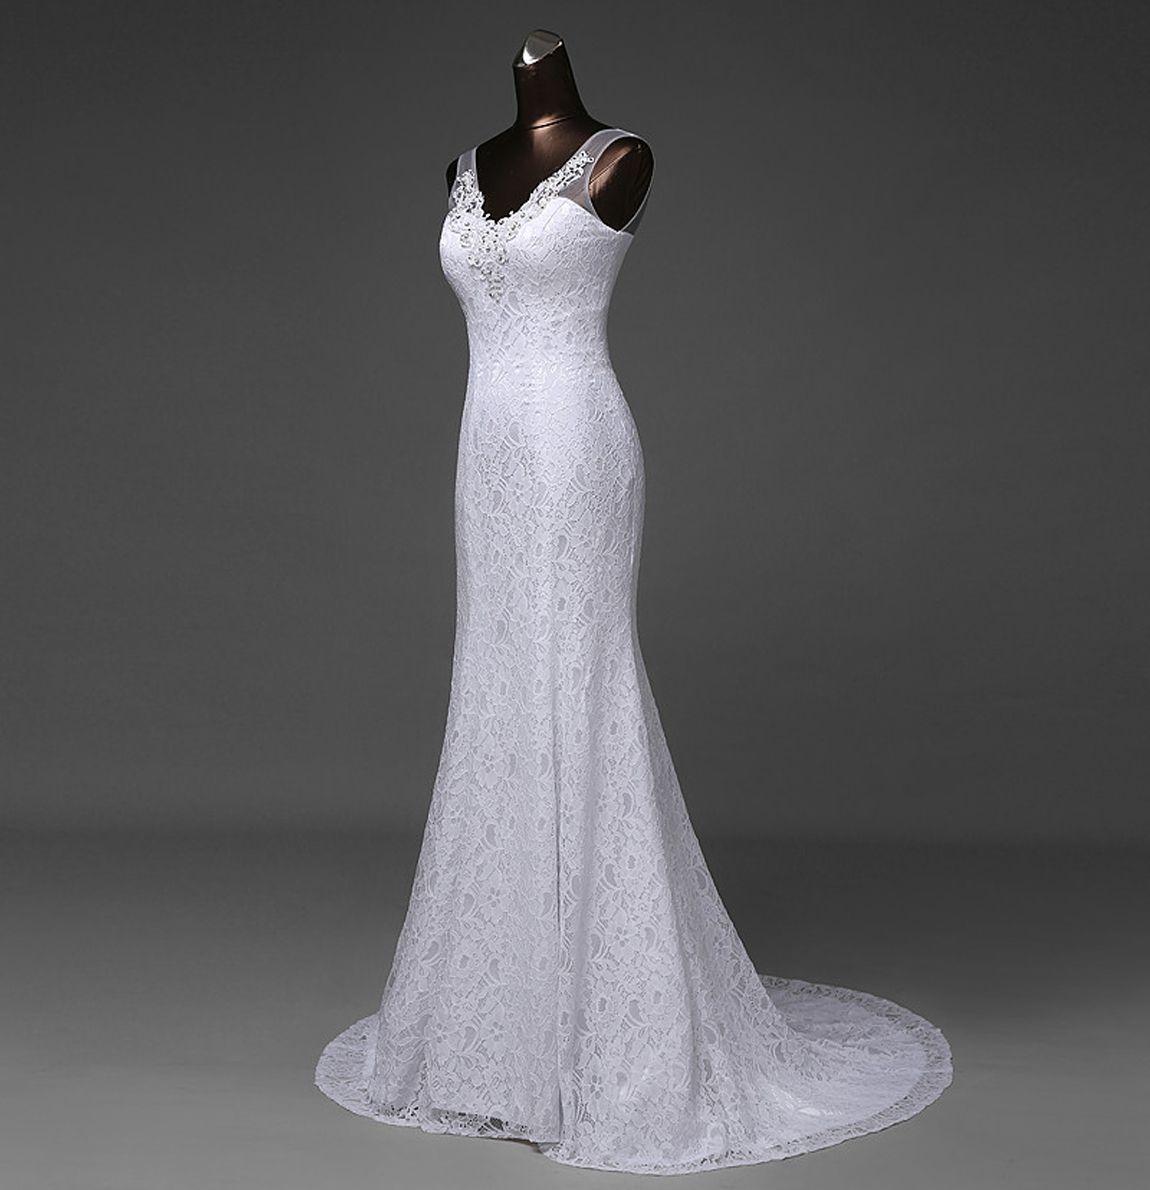 V Neck Lace Mermaid Wedding Dress With Beads Lace Up 2020 White Ivory Bride Dresses Long